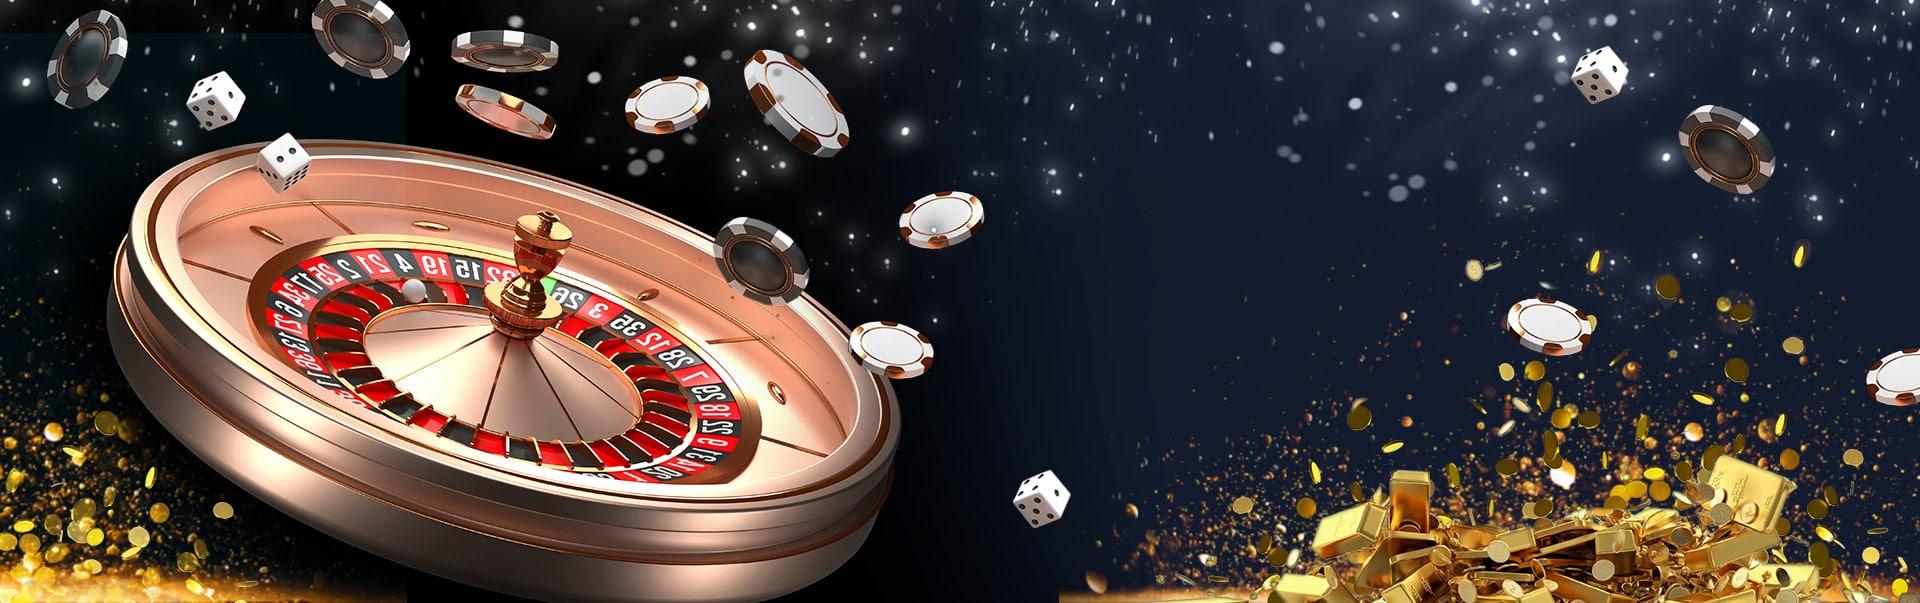 Casino gambling in canada anguilla casino